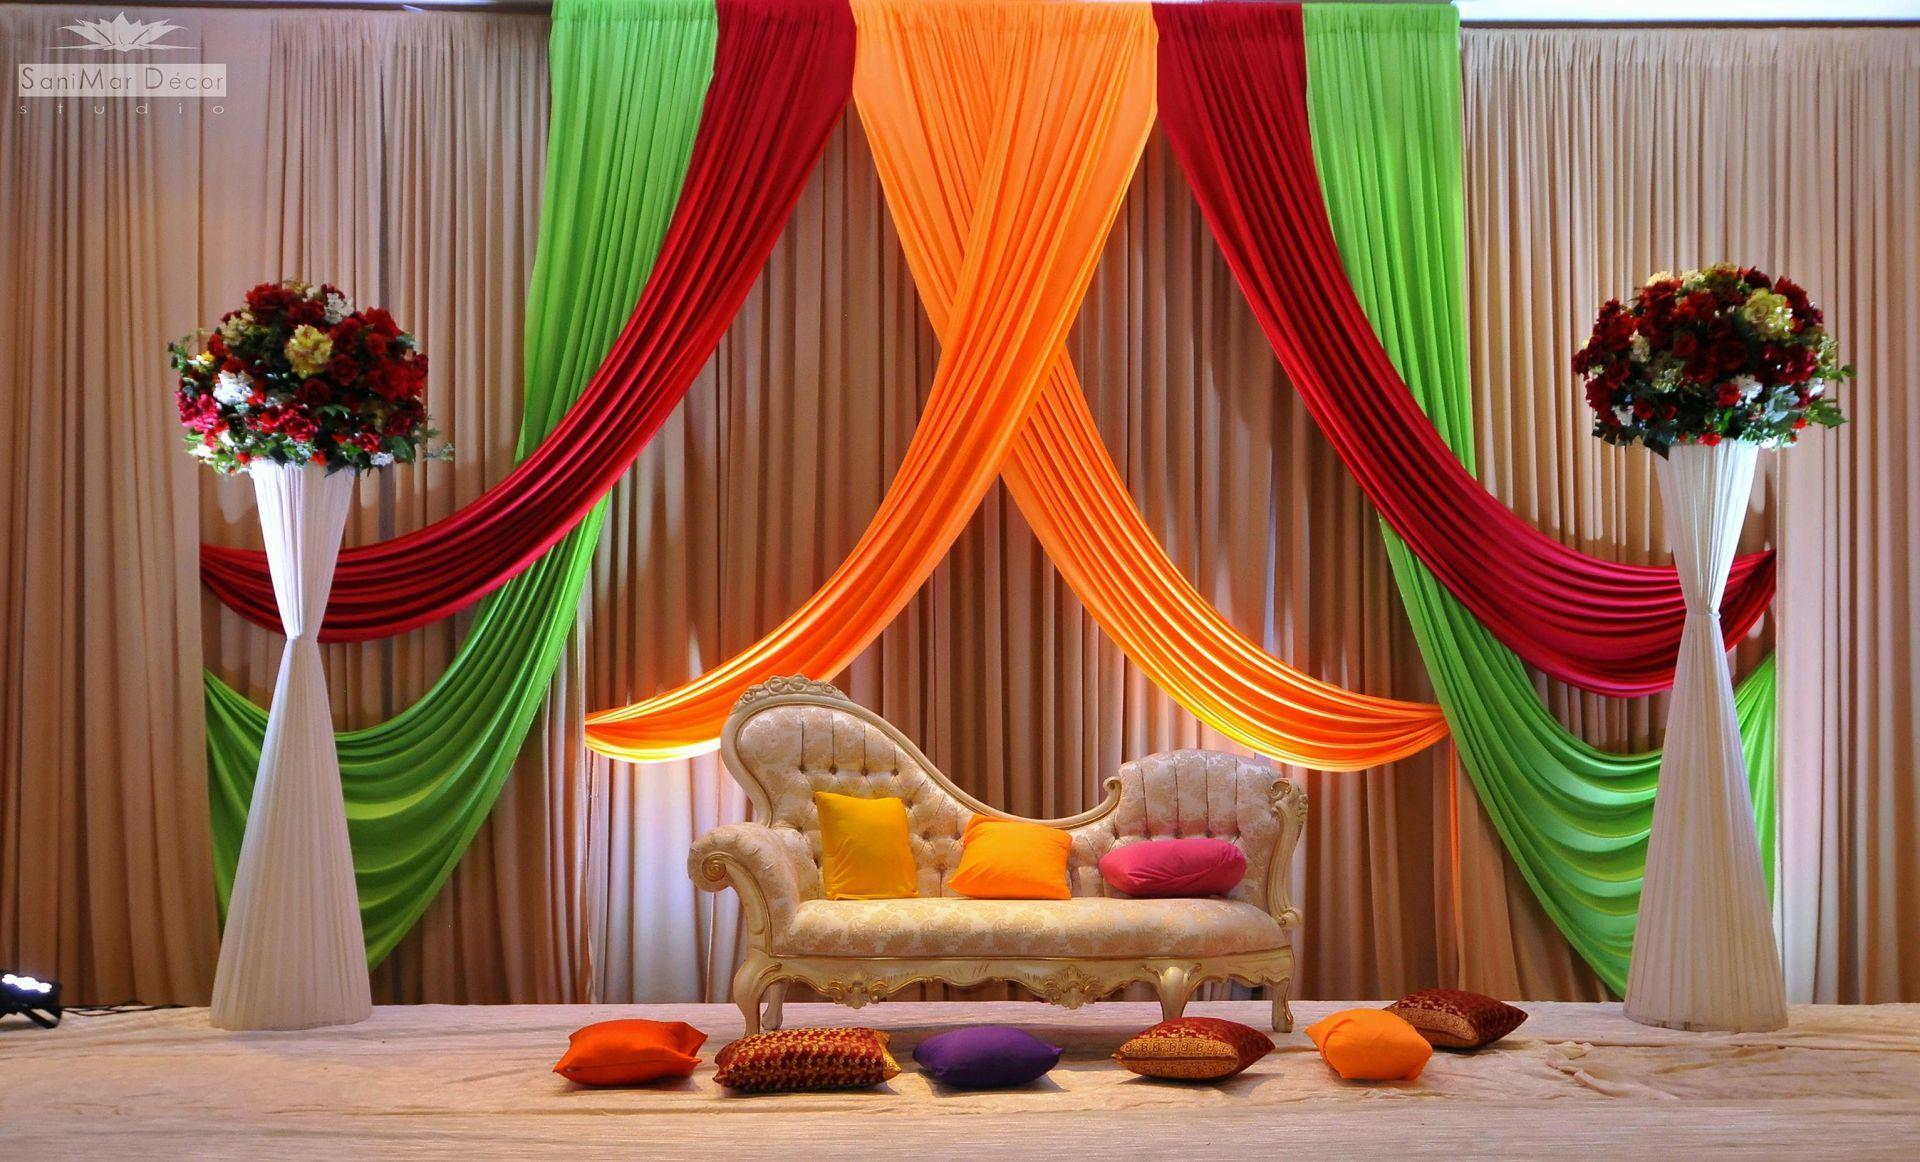 Indian Wedding Stage Decoration Idea Indoor Wedding Decorations Stage Decorations Wedding Decor Elegant